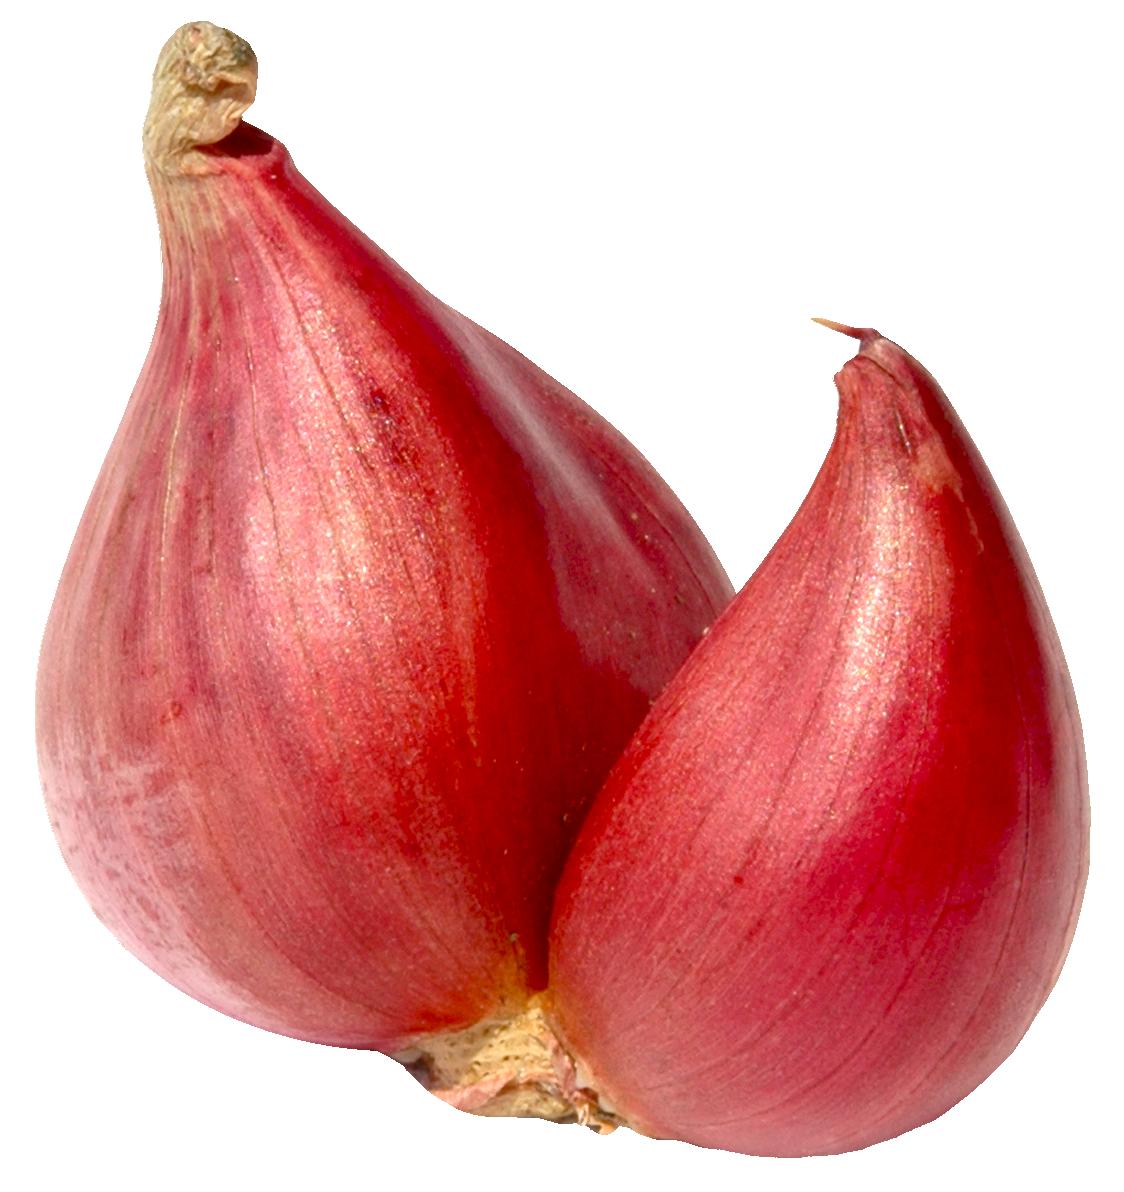 Onion clipart onion peel. Png images pngpix shallot